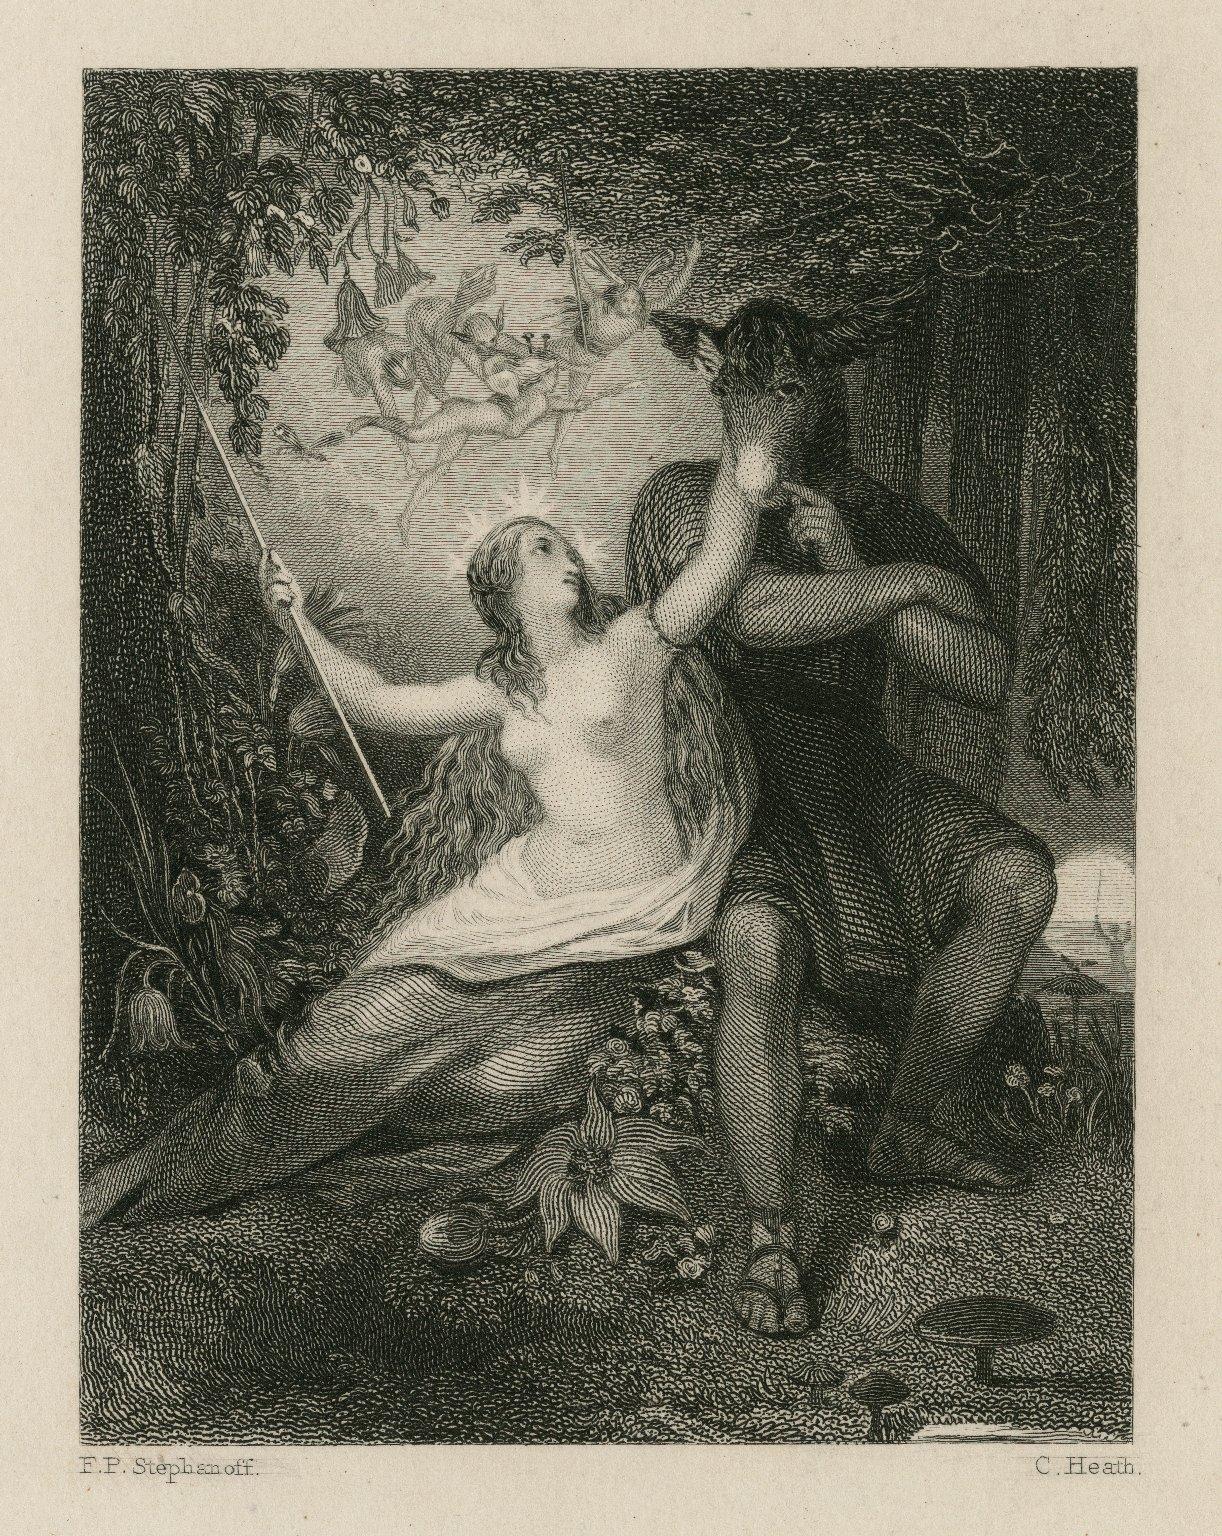 Midsummer-night's dream, Titania: While I thy amiable cheeks do coy, act IV, sc. 1 [graphic] / F.P. Stephanoff ; C. Heath.